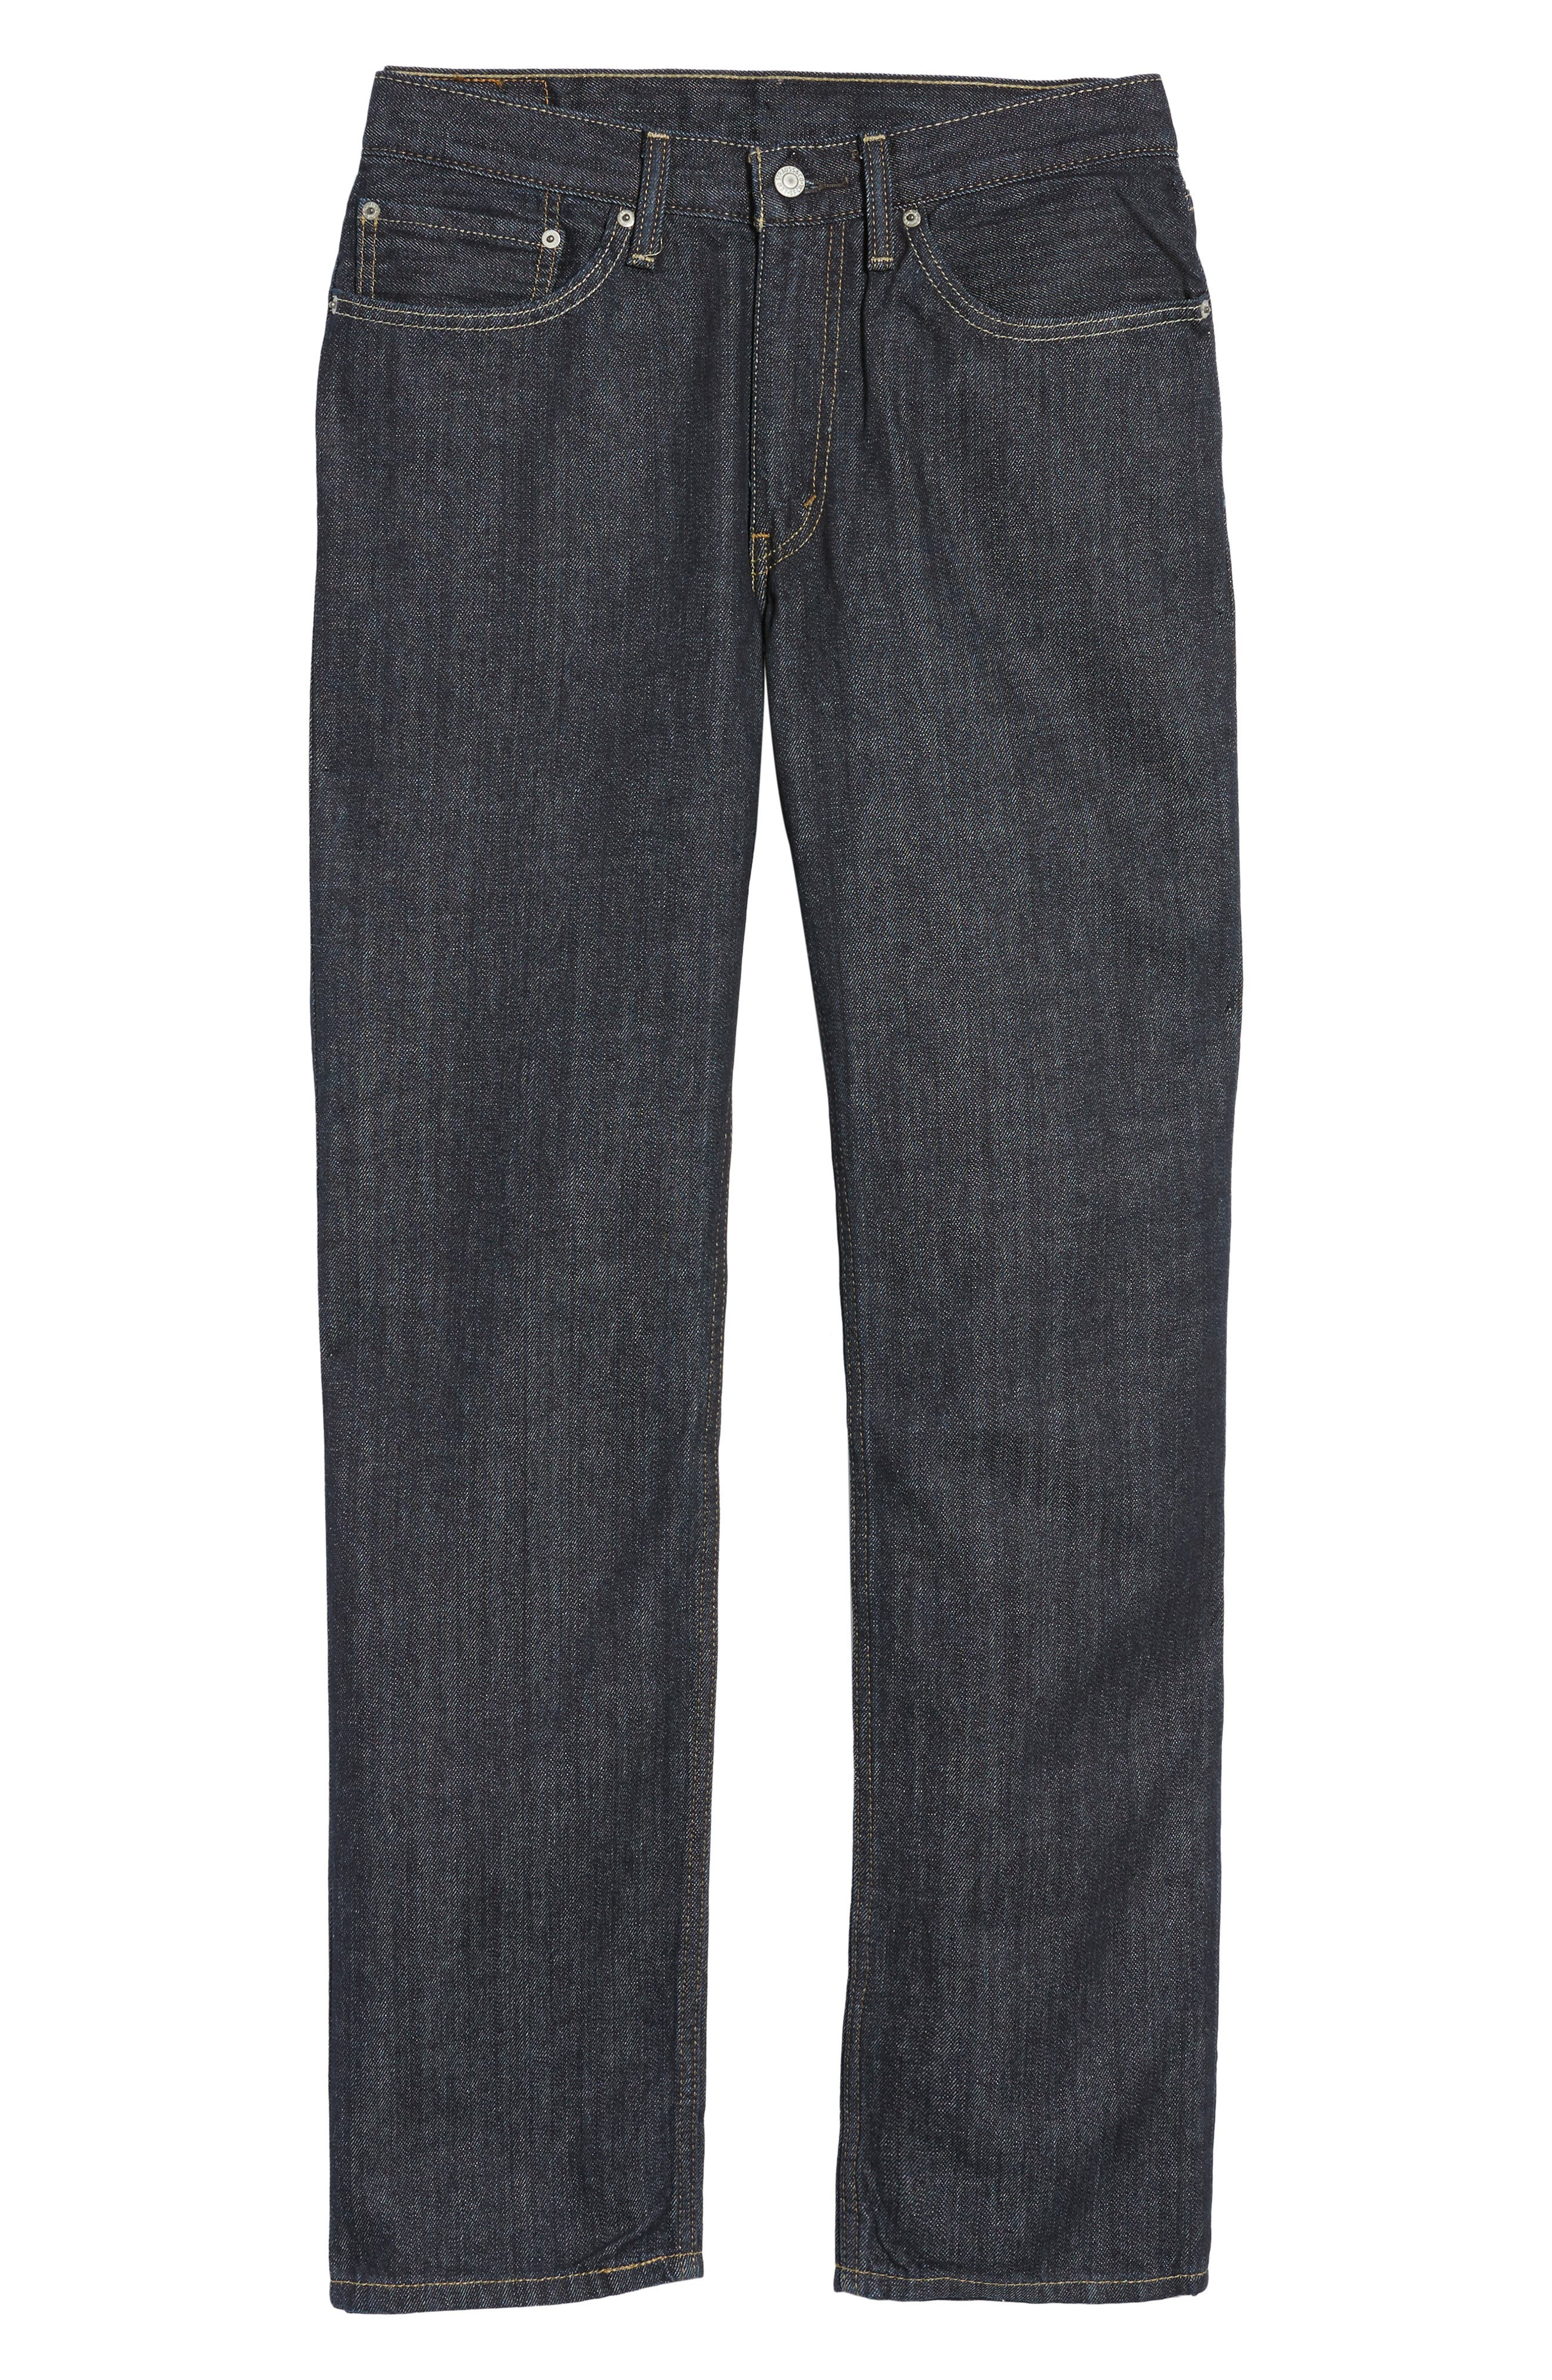 Men's Levi's 514(TM) Straight Leg Jeans,  38 x 34 - Blue